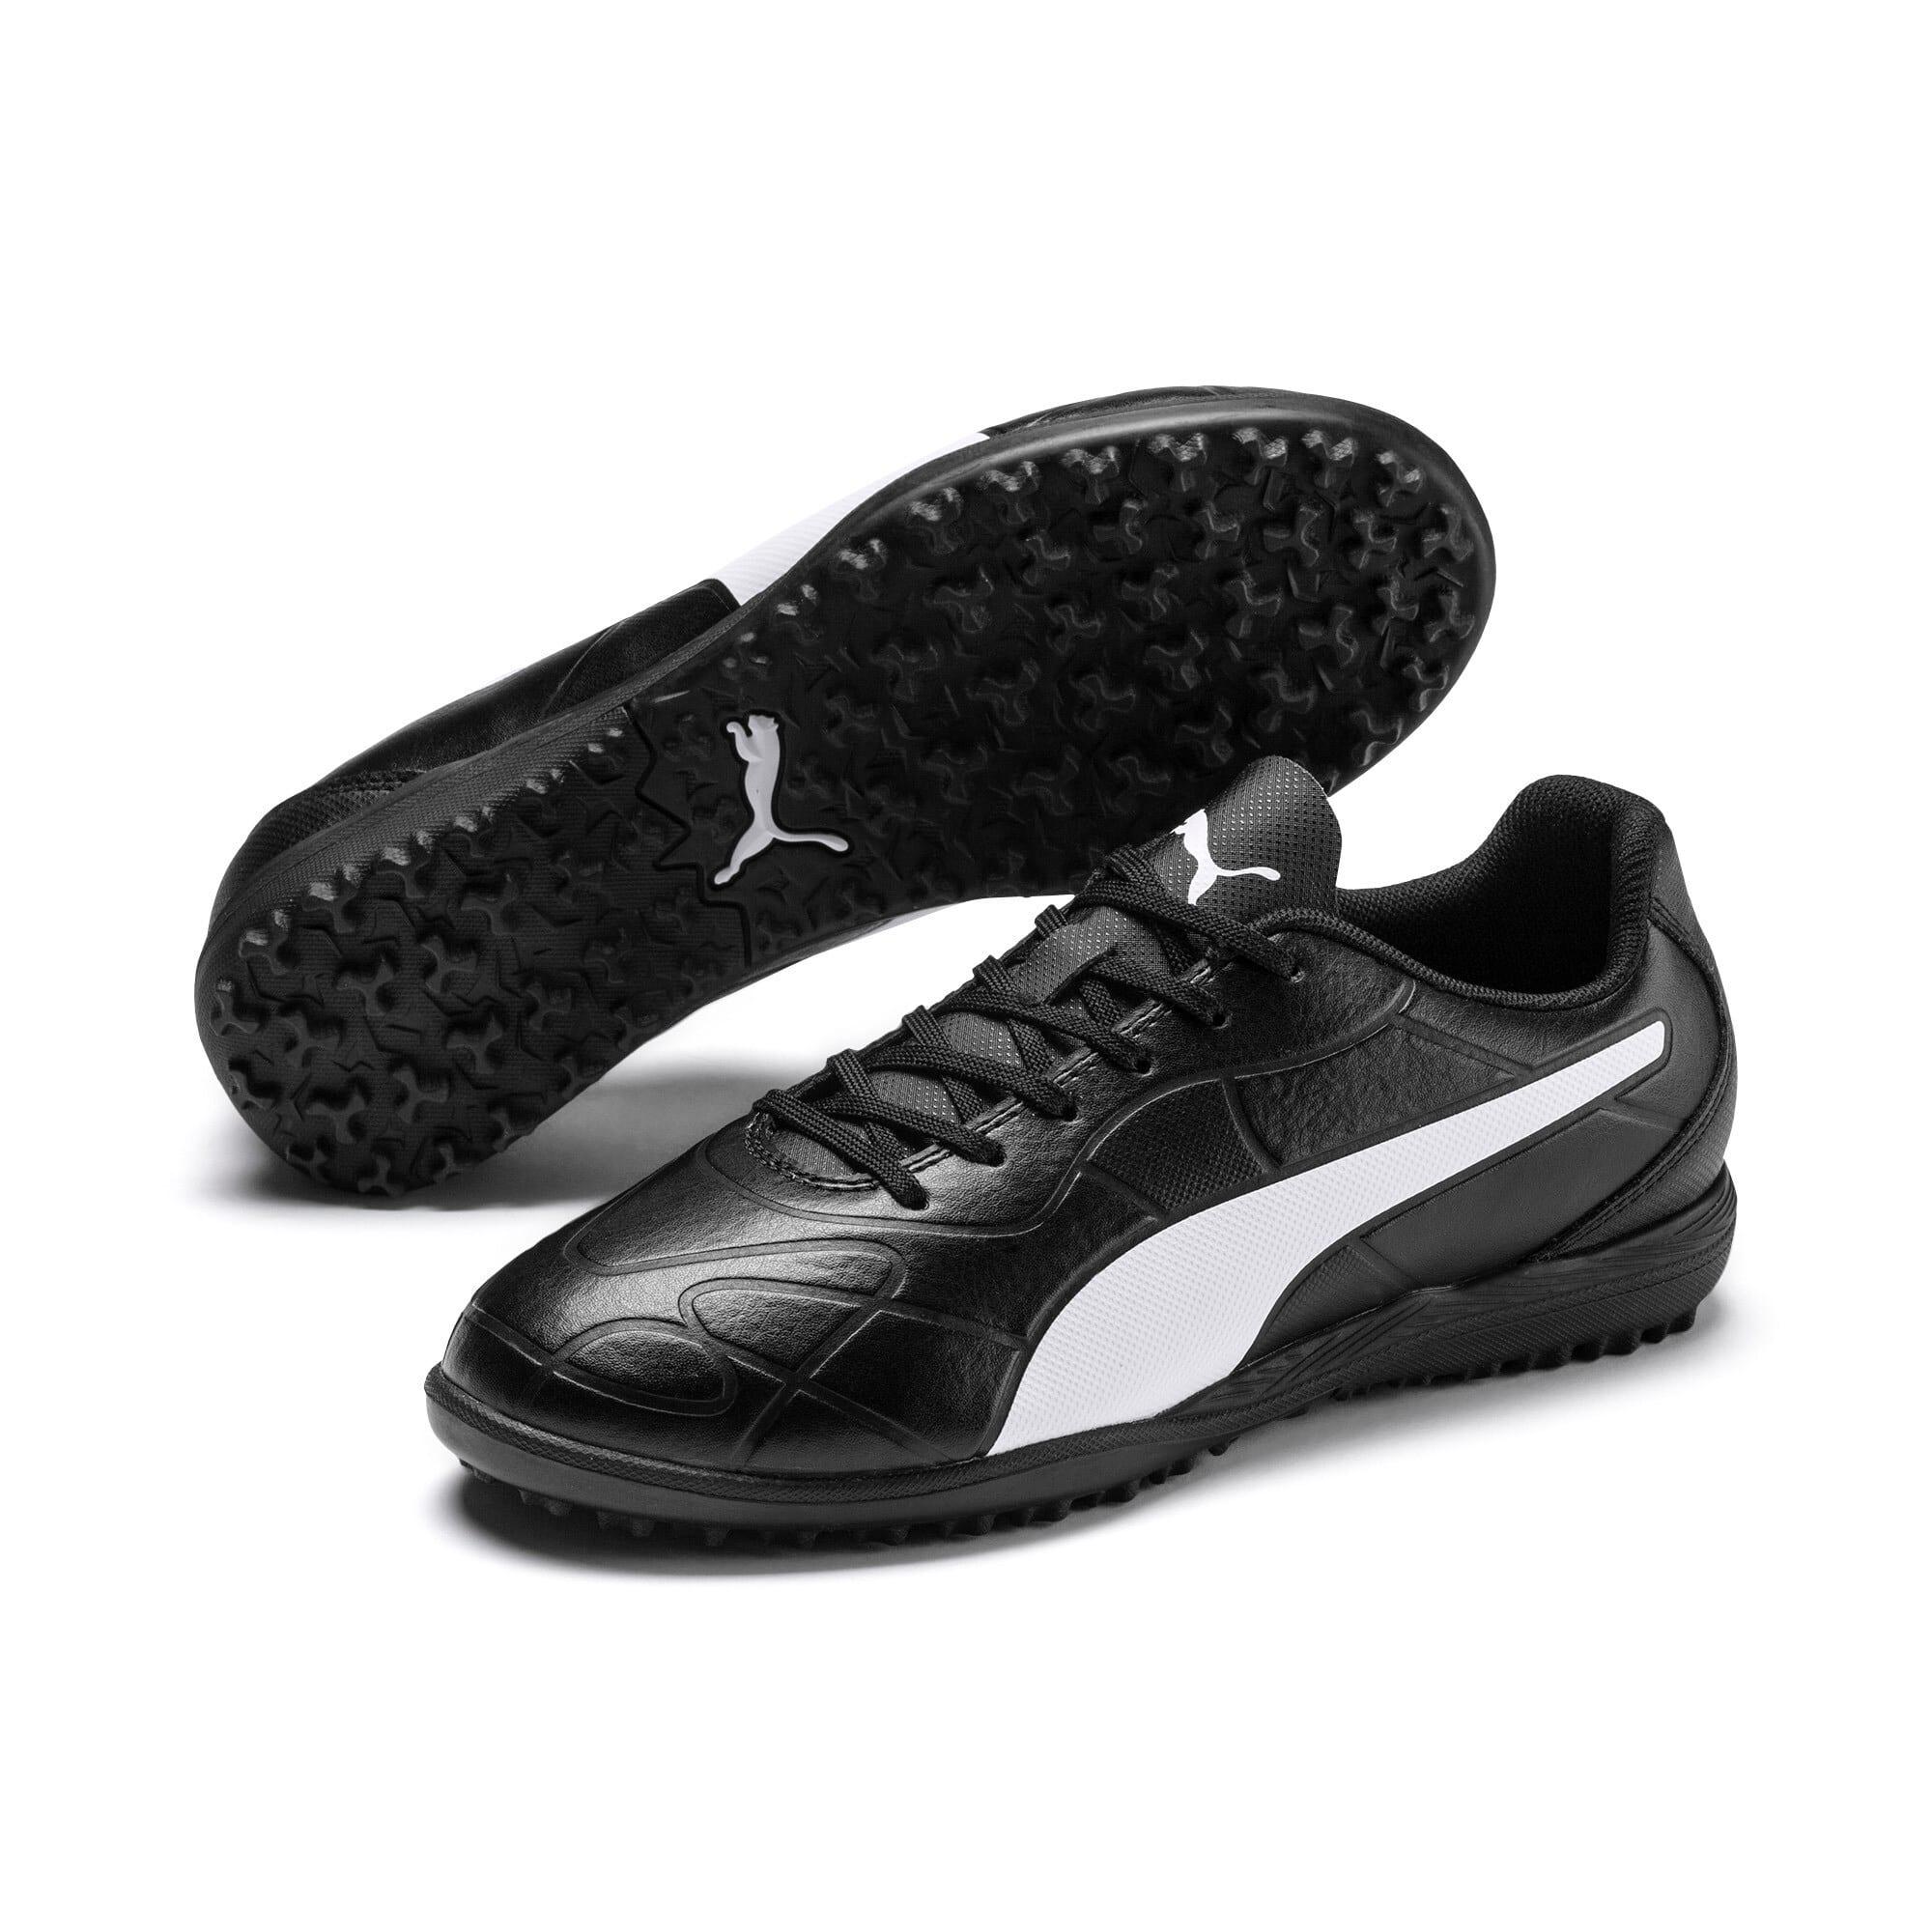 Thumbnail 2 of Monarch TT Youth Football Boots, Puma Black-Puma White, medium